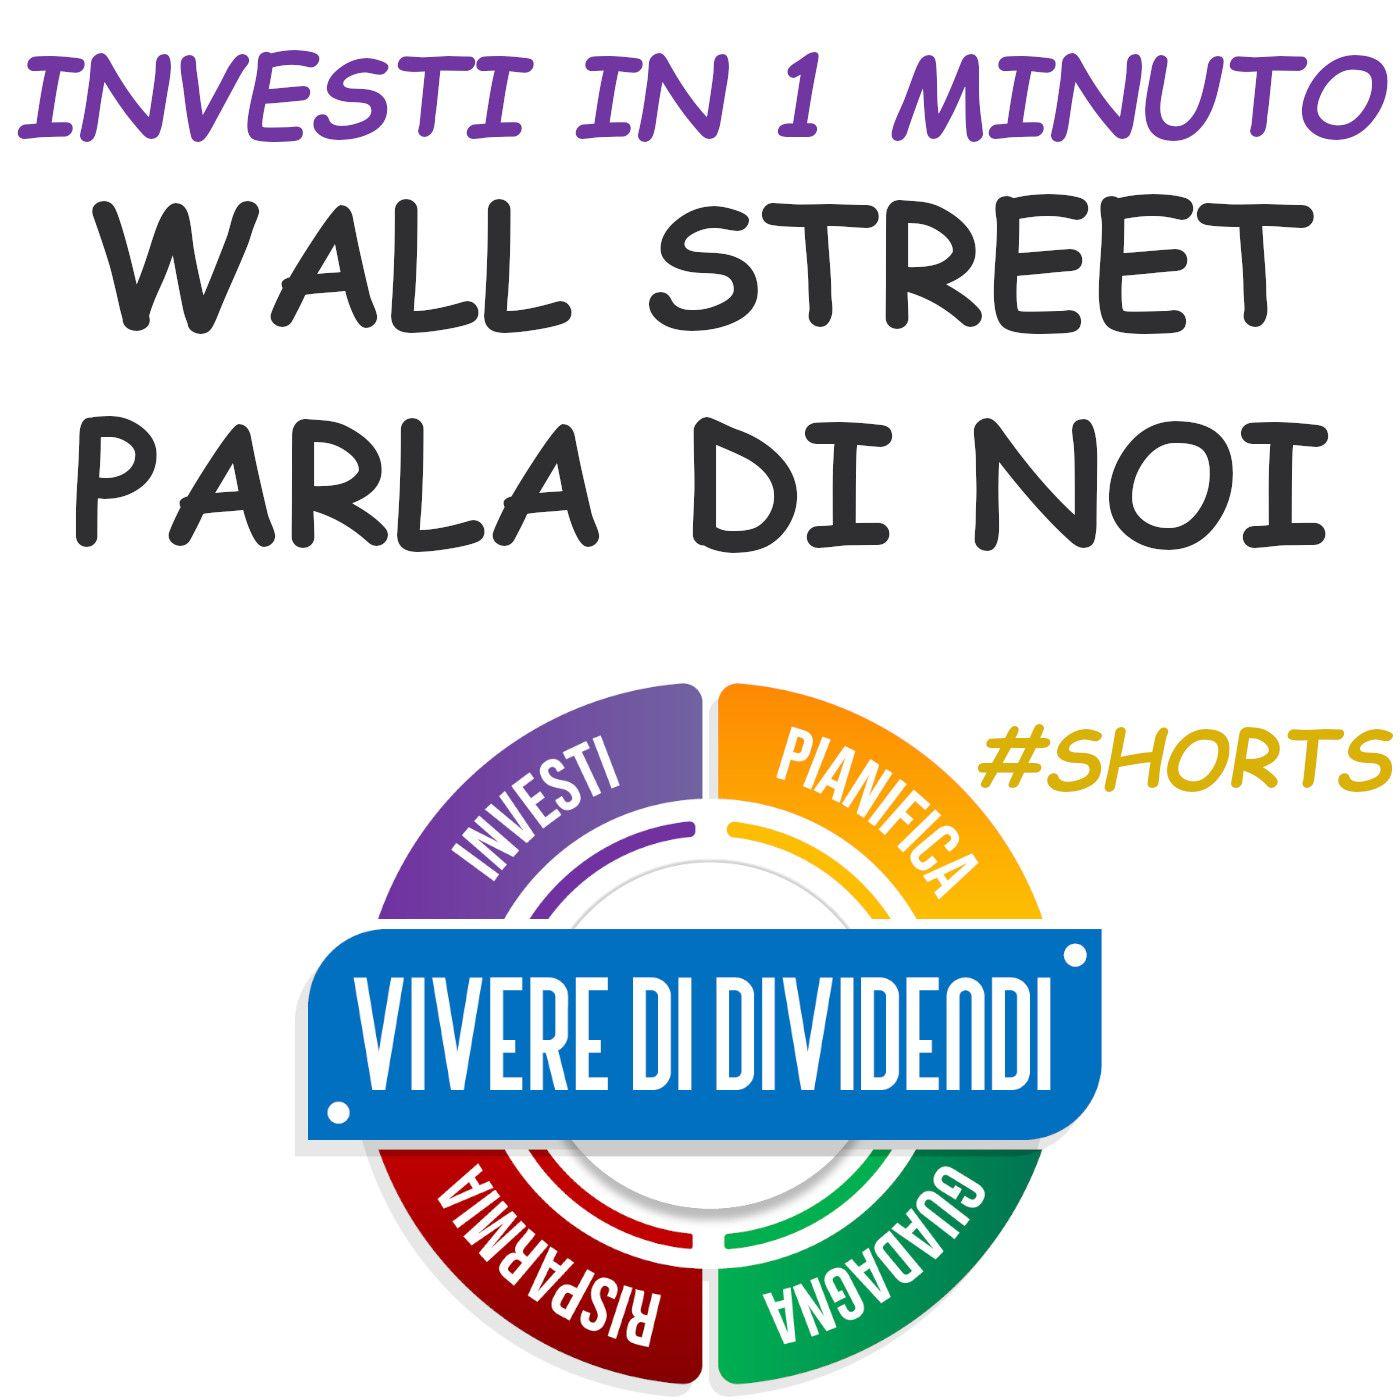 WALL STREET parla di noi! #shorts